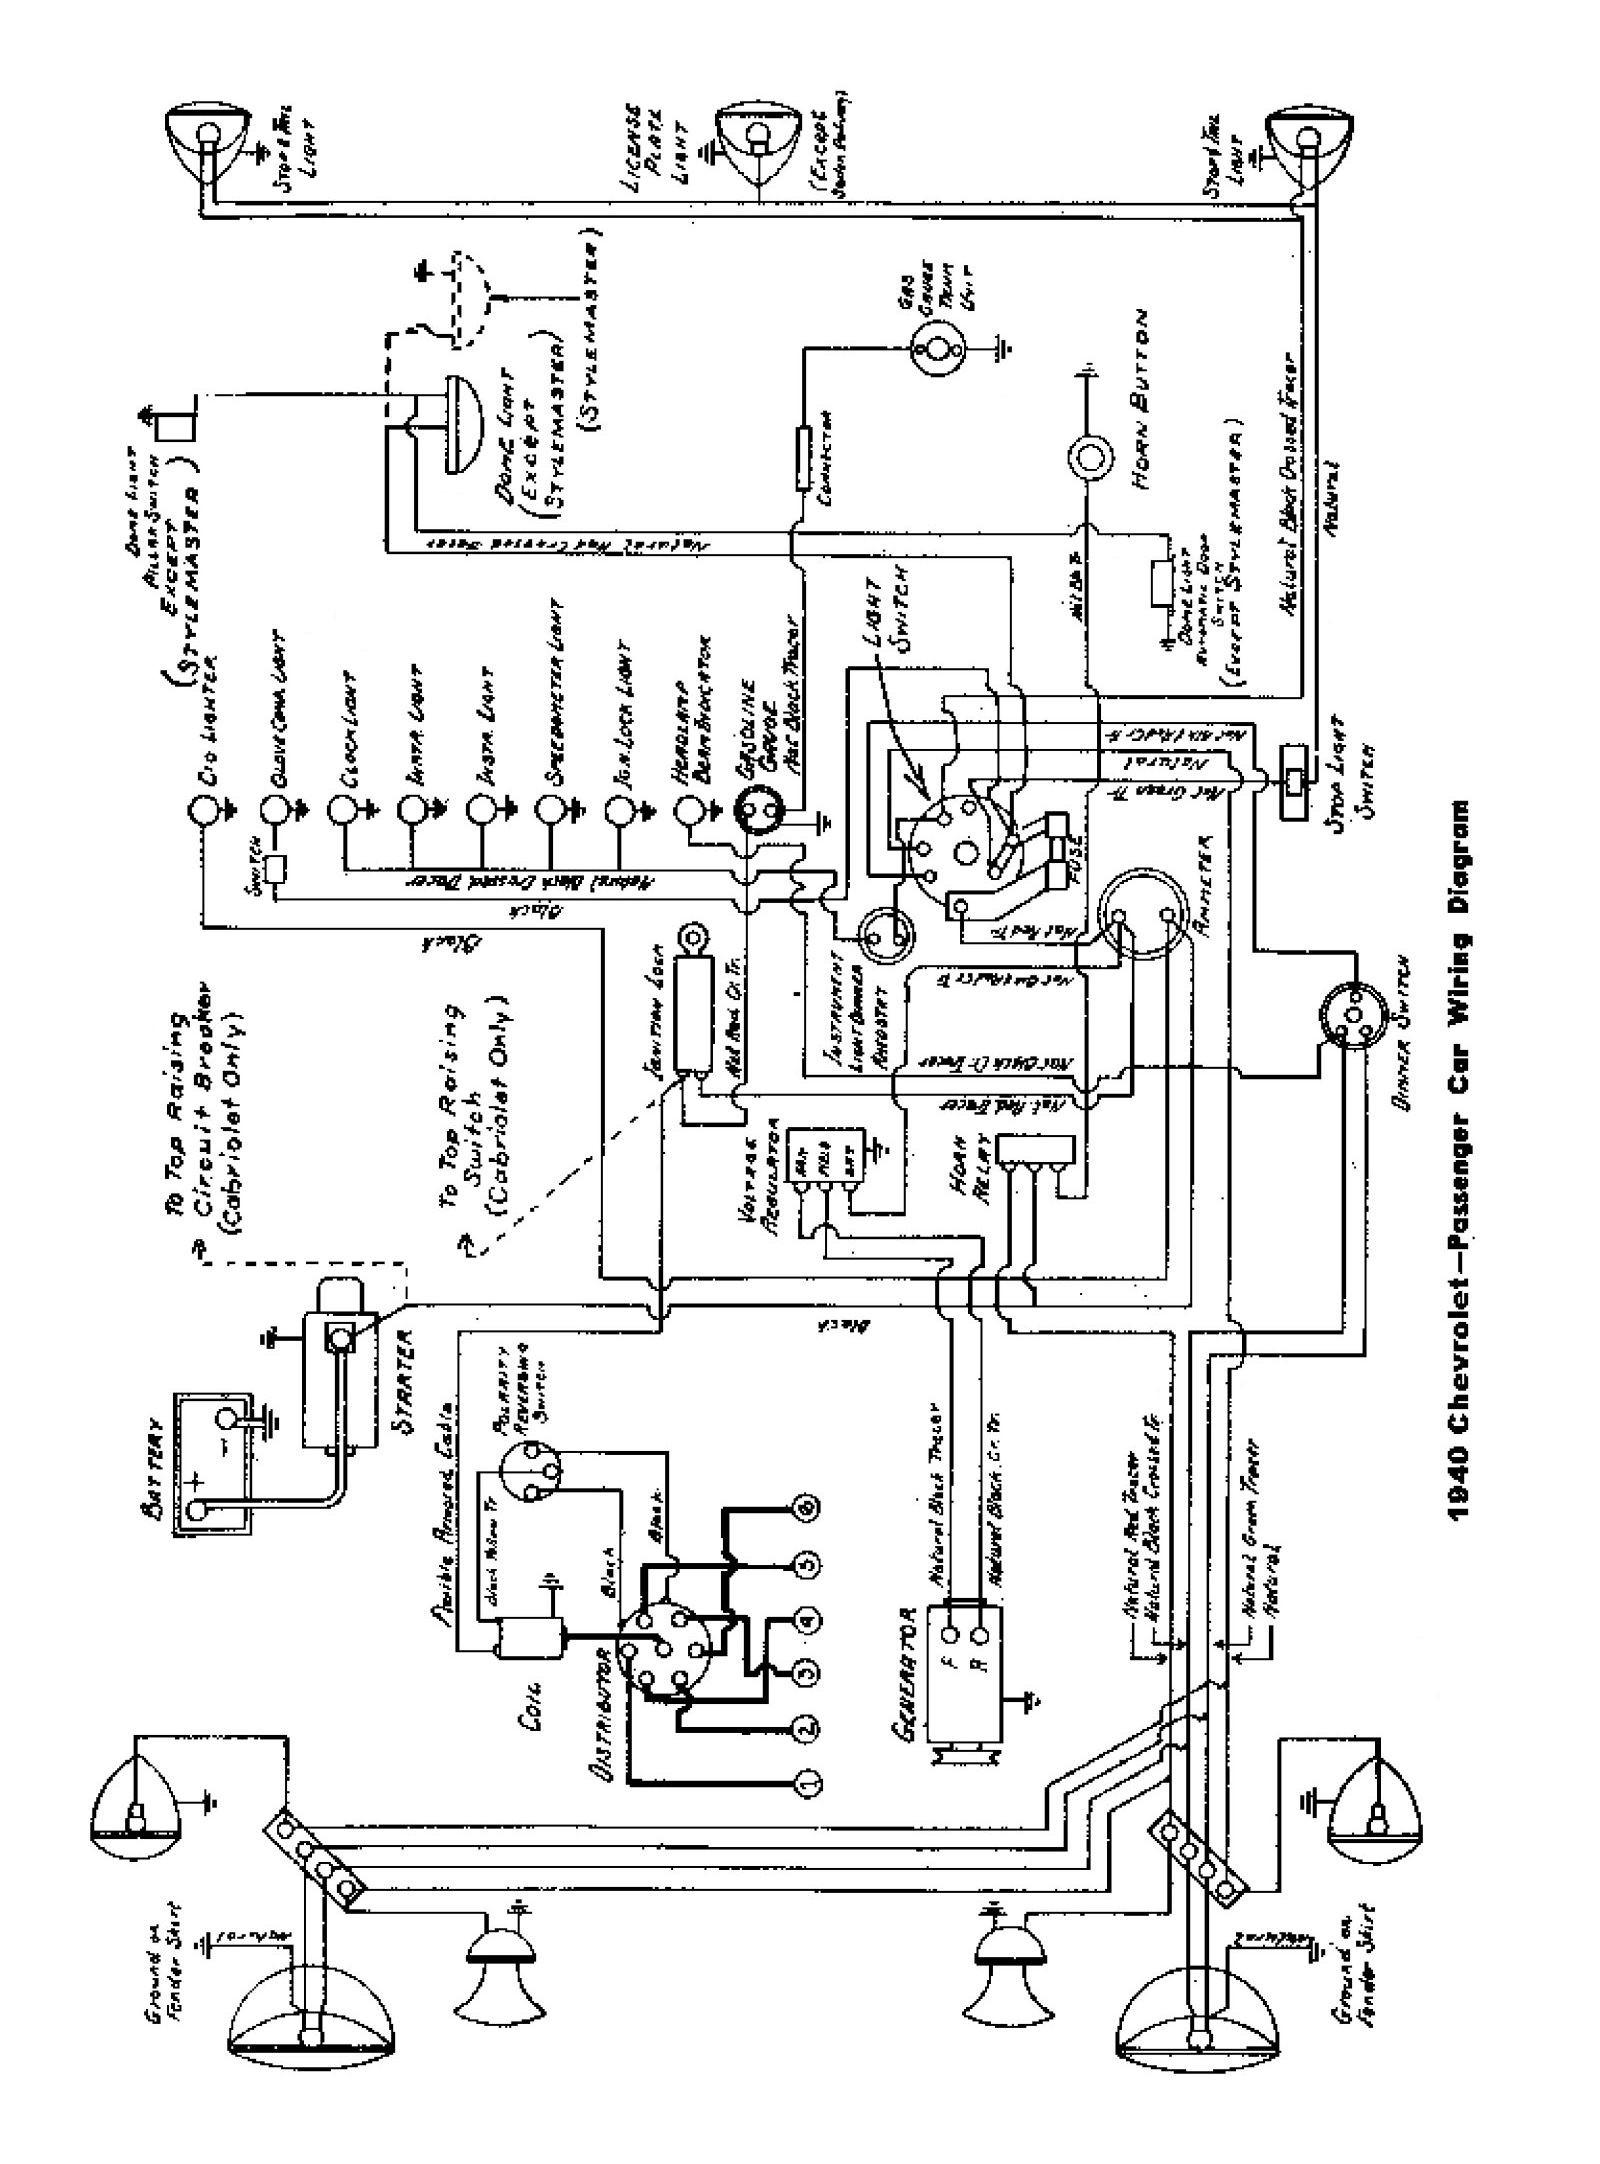 Car Ignition System Wiring Diagram Wiring Diagrams Of Car Ignition System Wiring Diagram